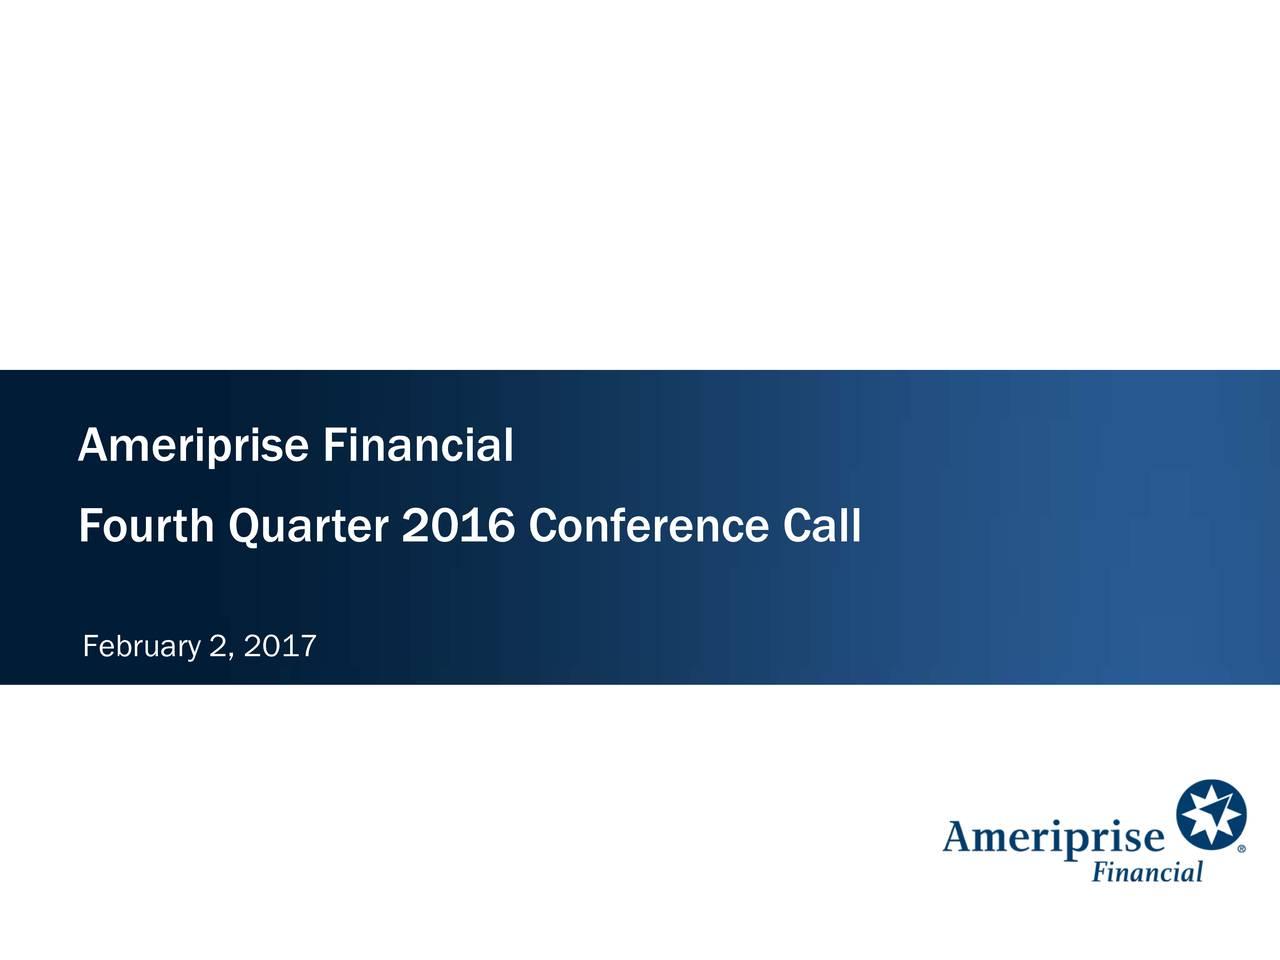 Fourth Quarter 2016 Conference Call February 2, 2017